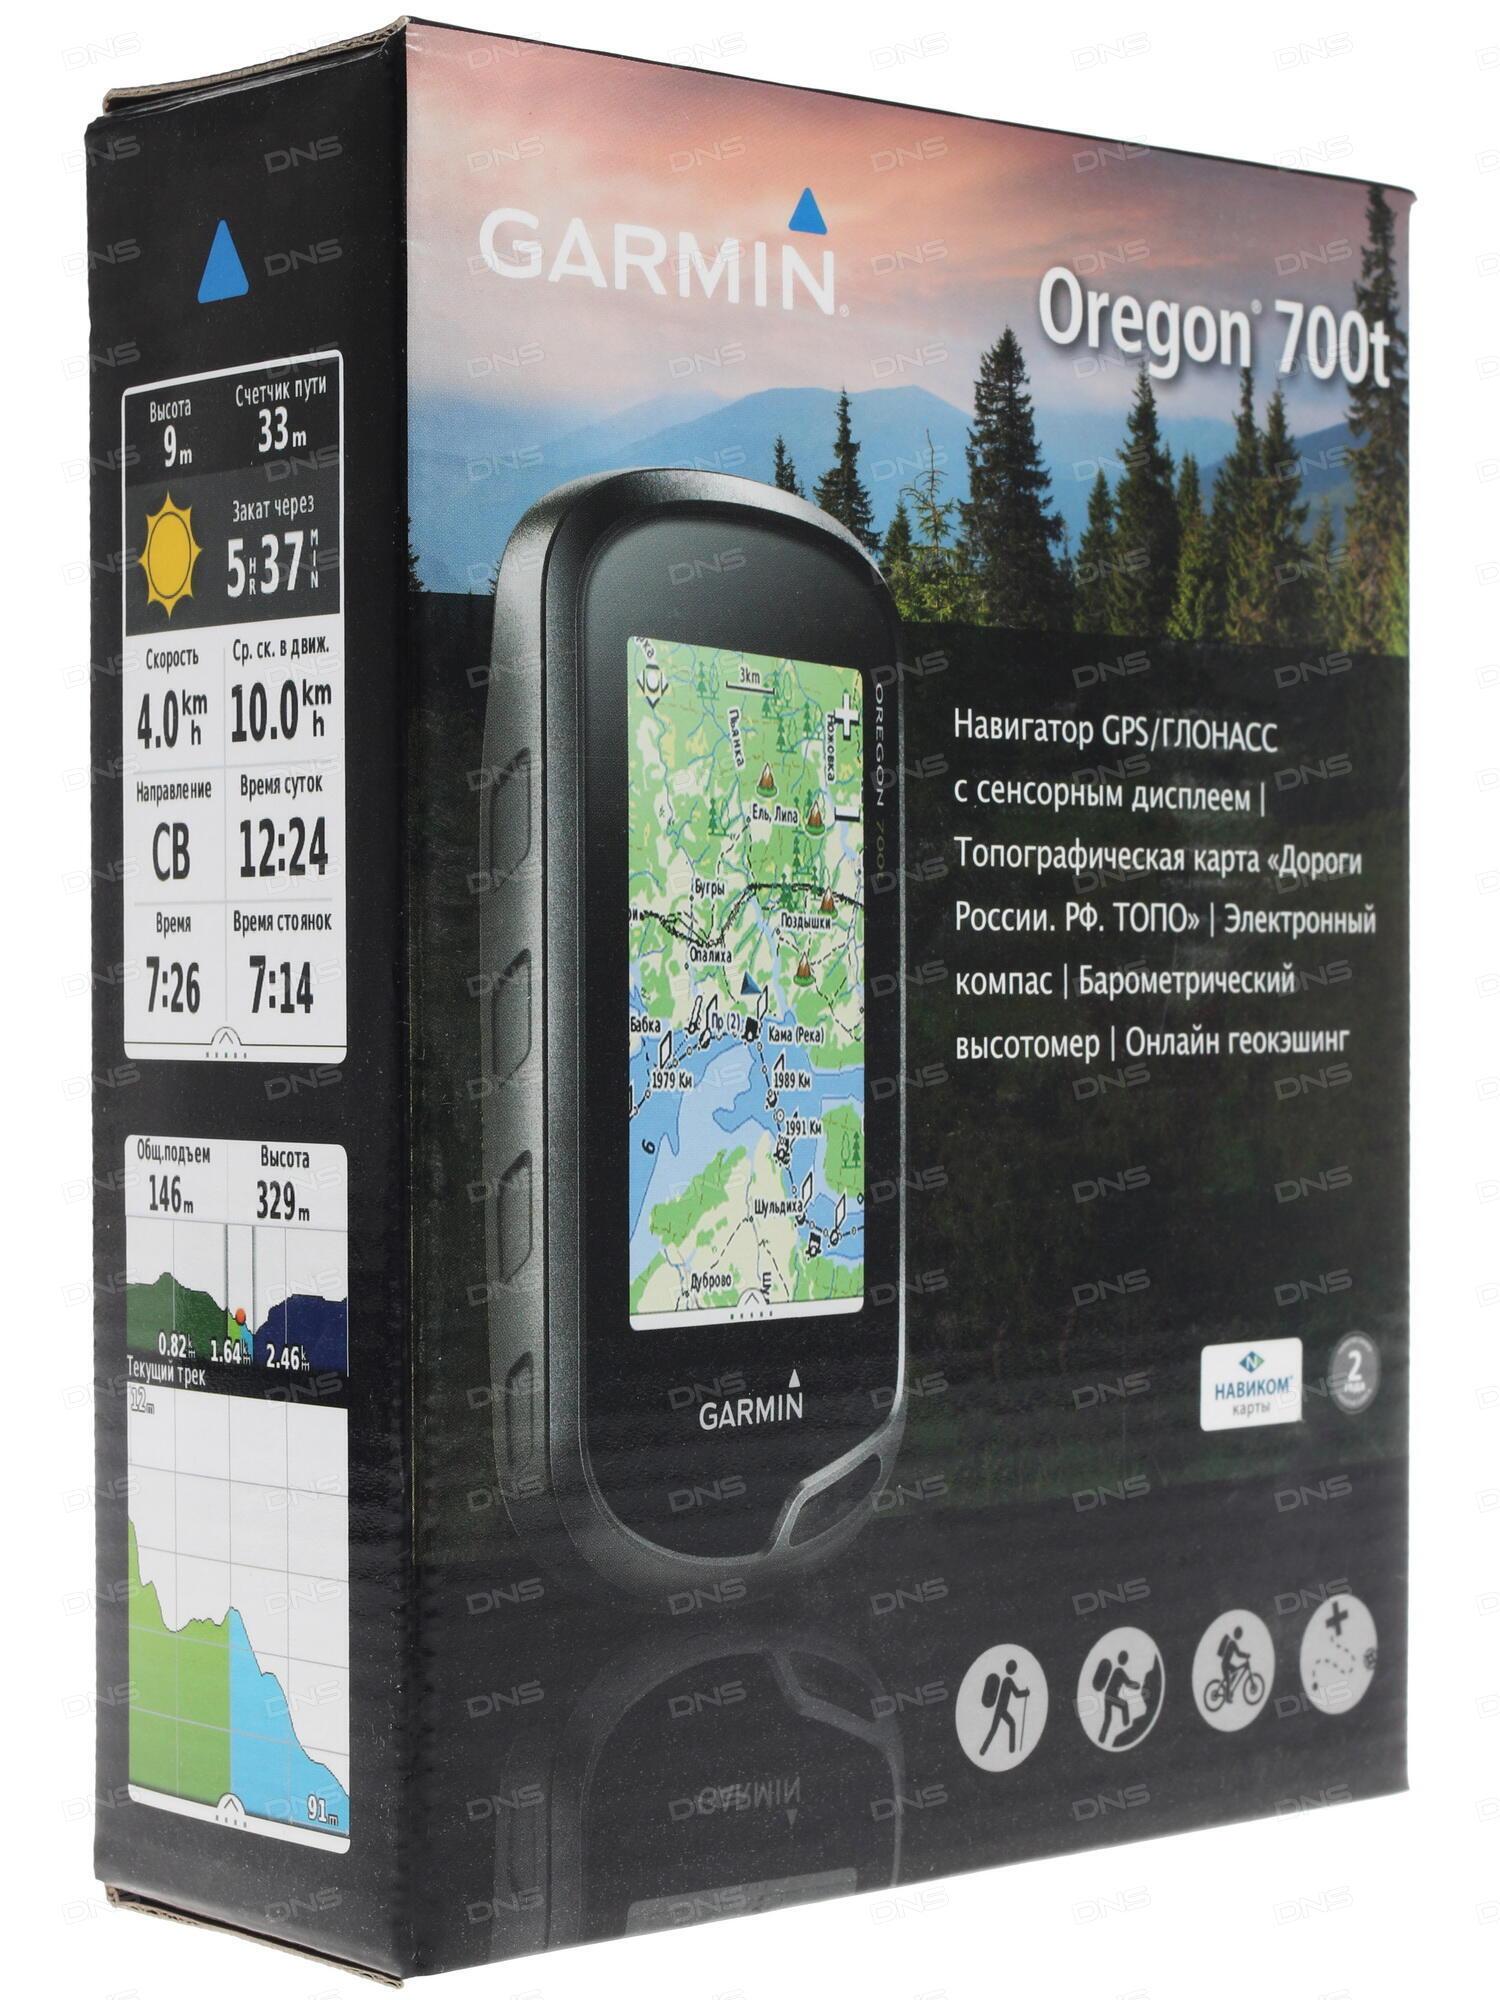 Oregon 700